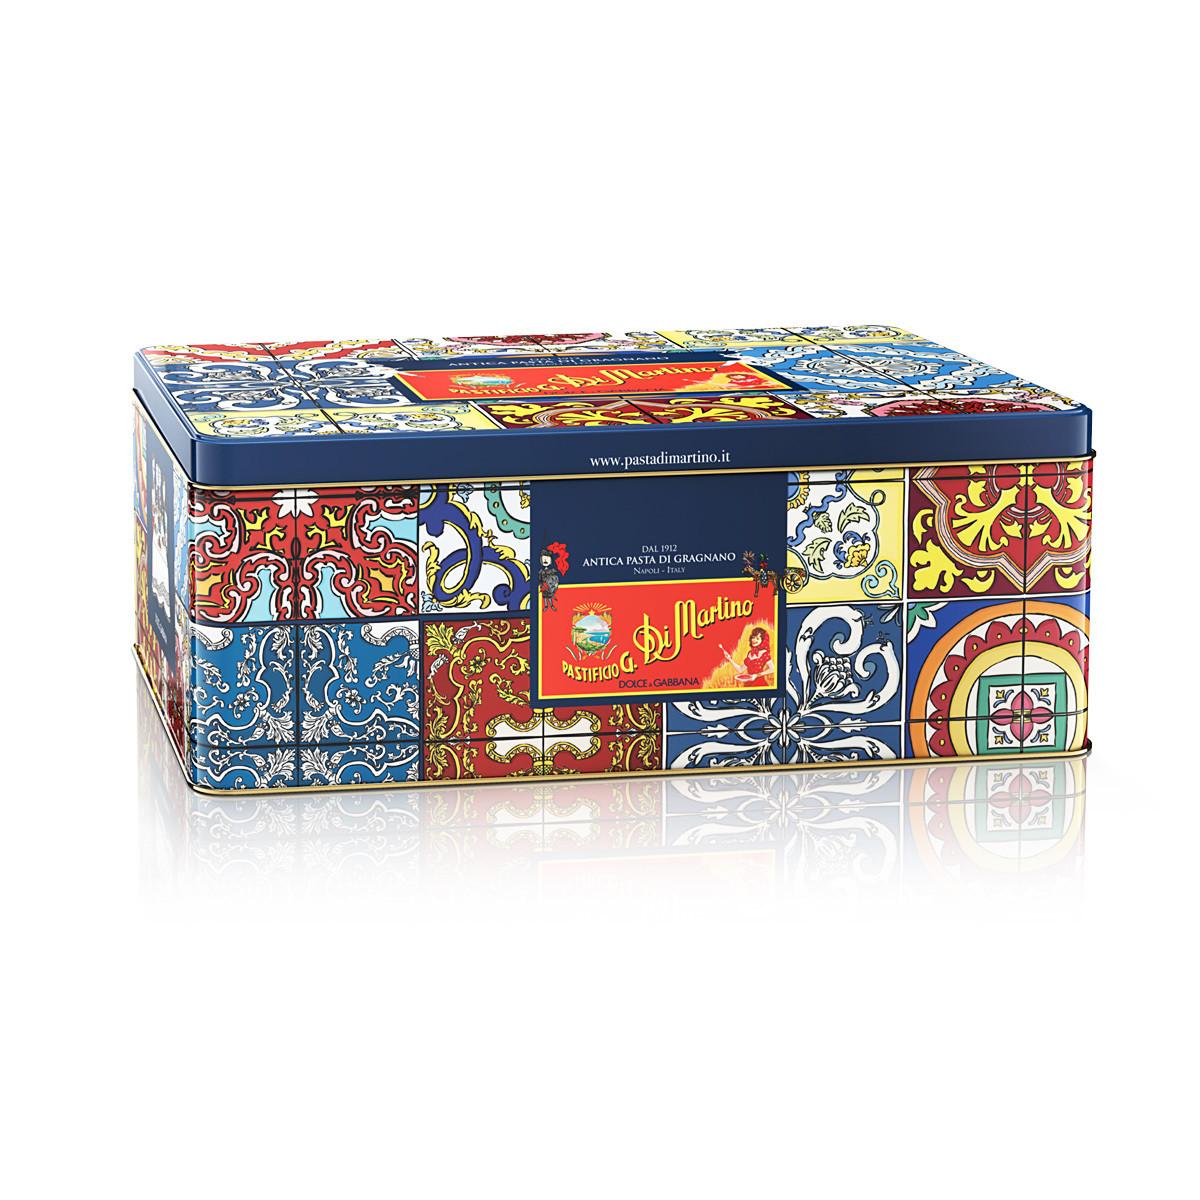 Подарочный набор, ДИ МАРТИНО D&G, фартук + макароны (5х500г) + жестяная коробка